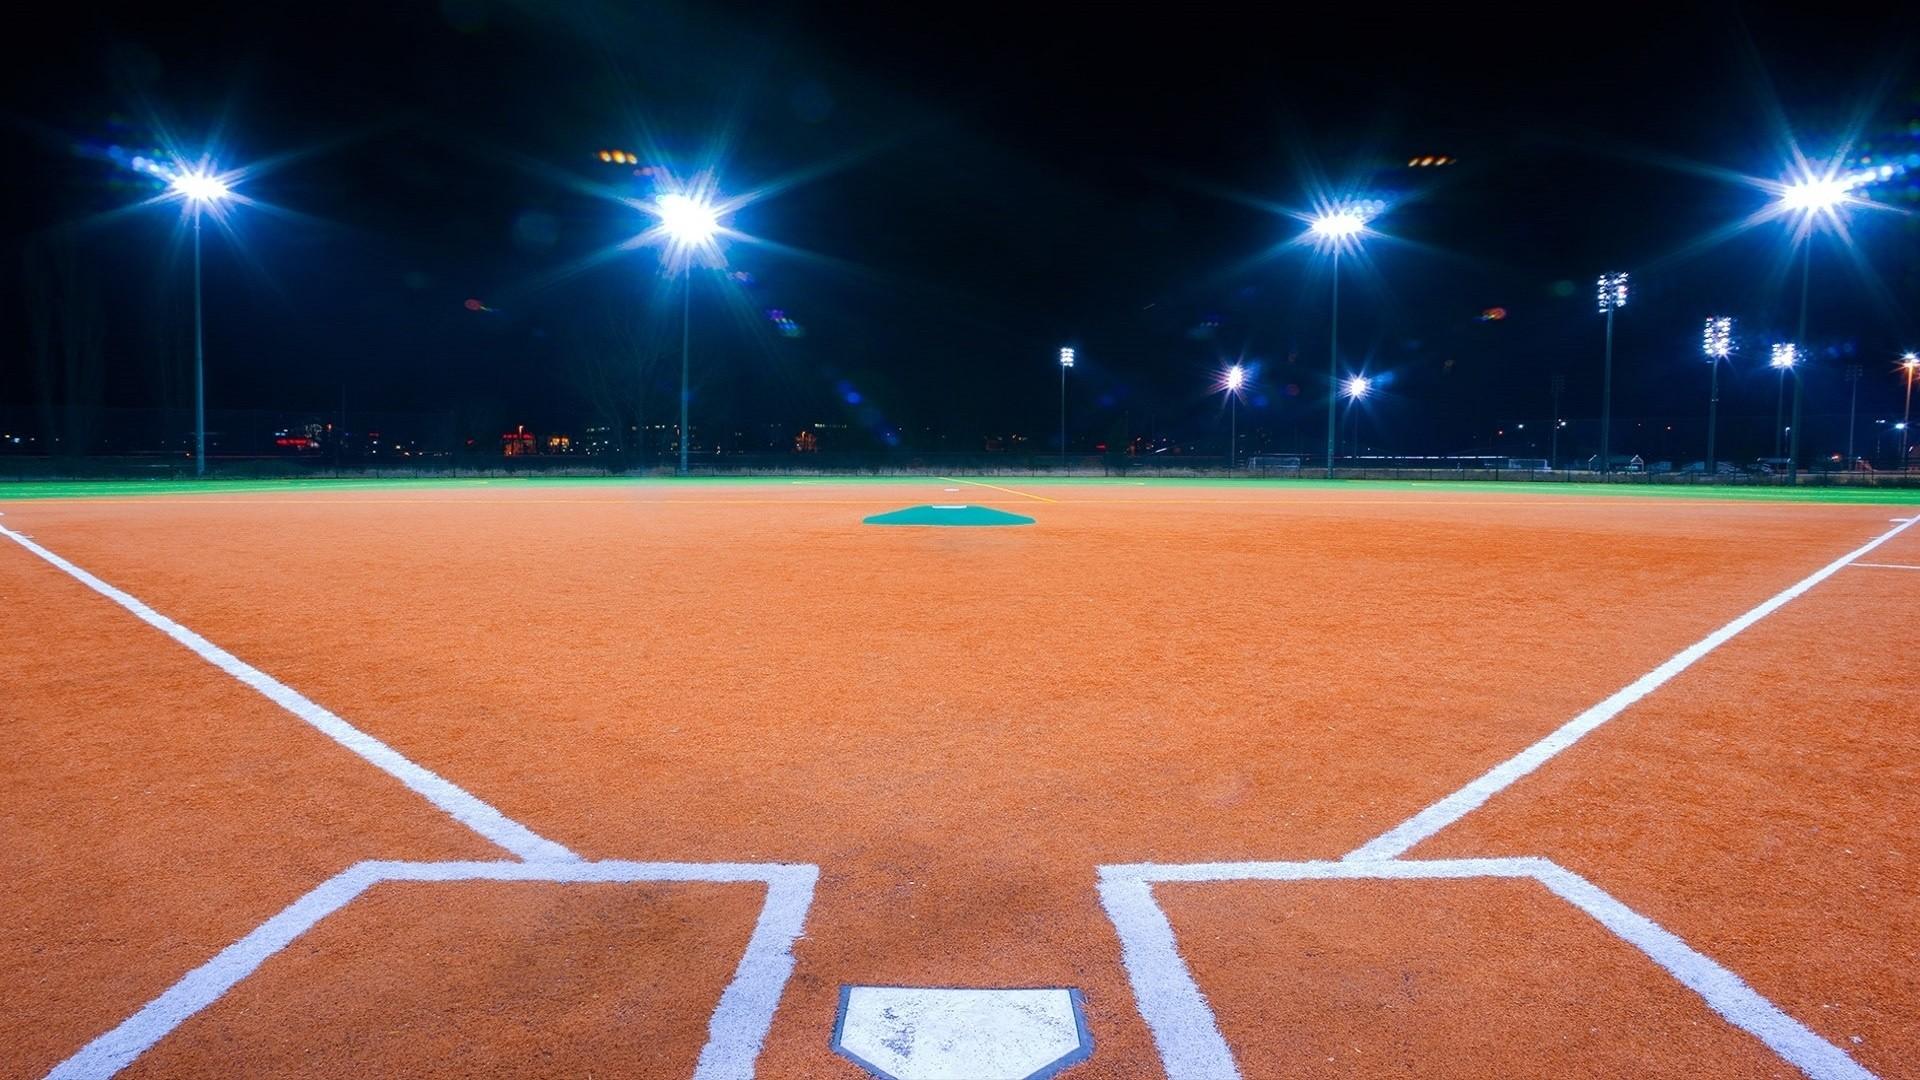 Softball Free Wallpaper